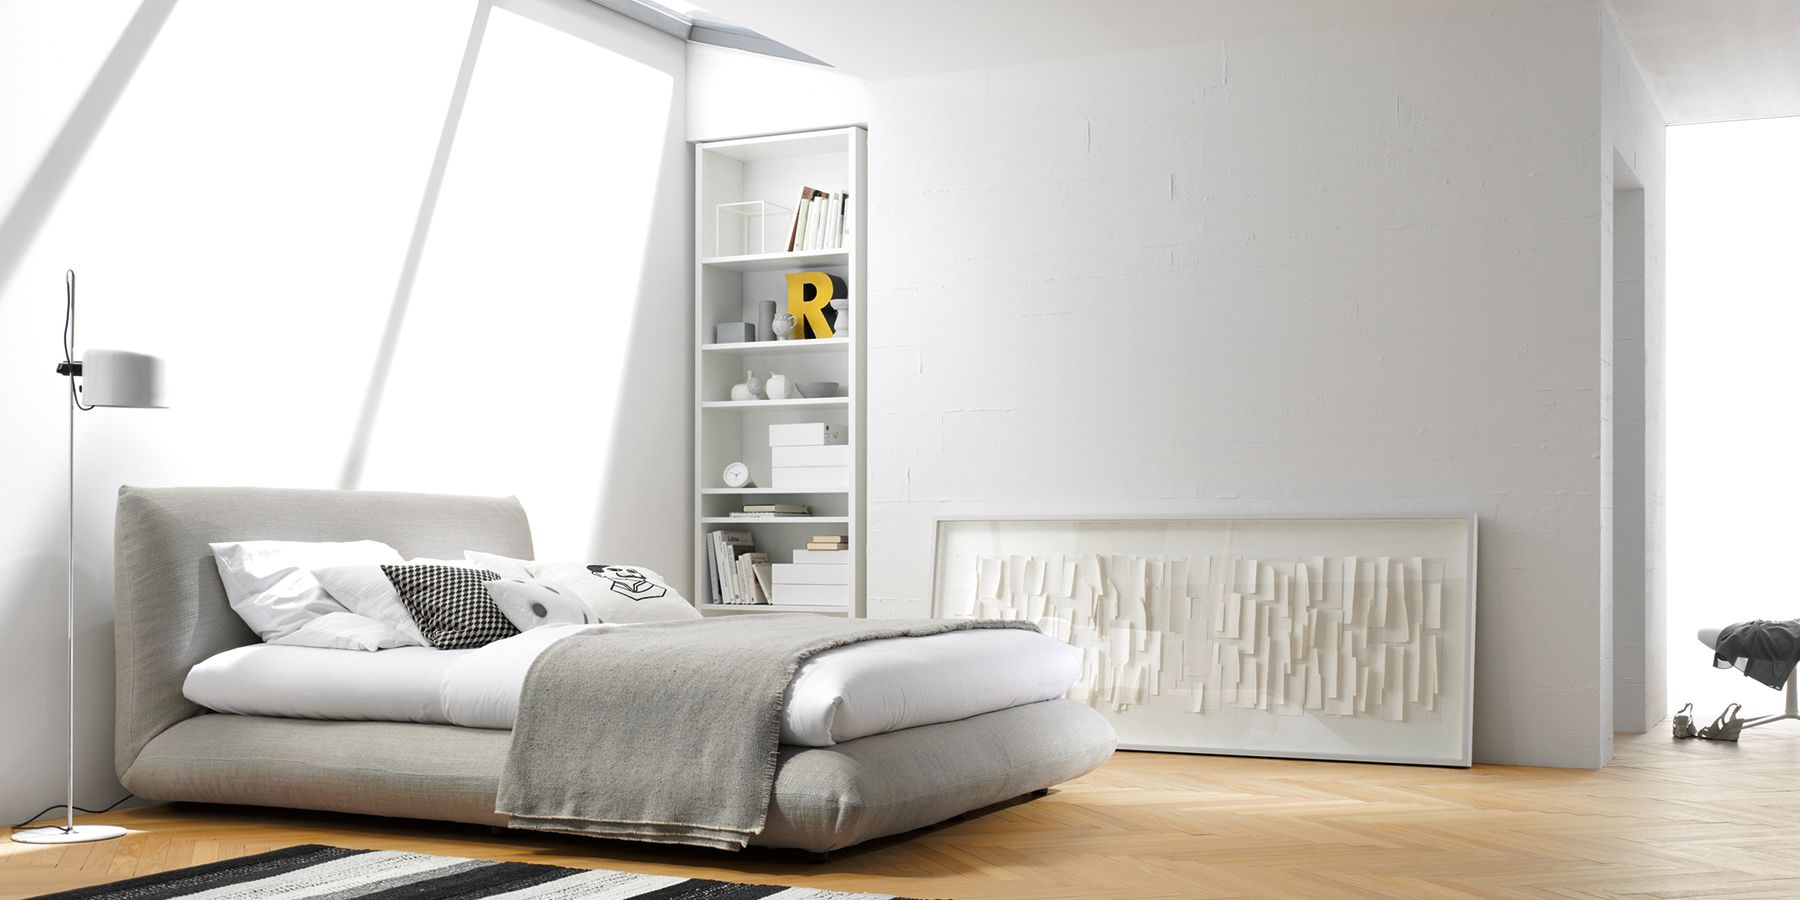 Interlubke Jalis bed. interlübke bed bedroom  ...